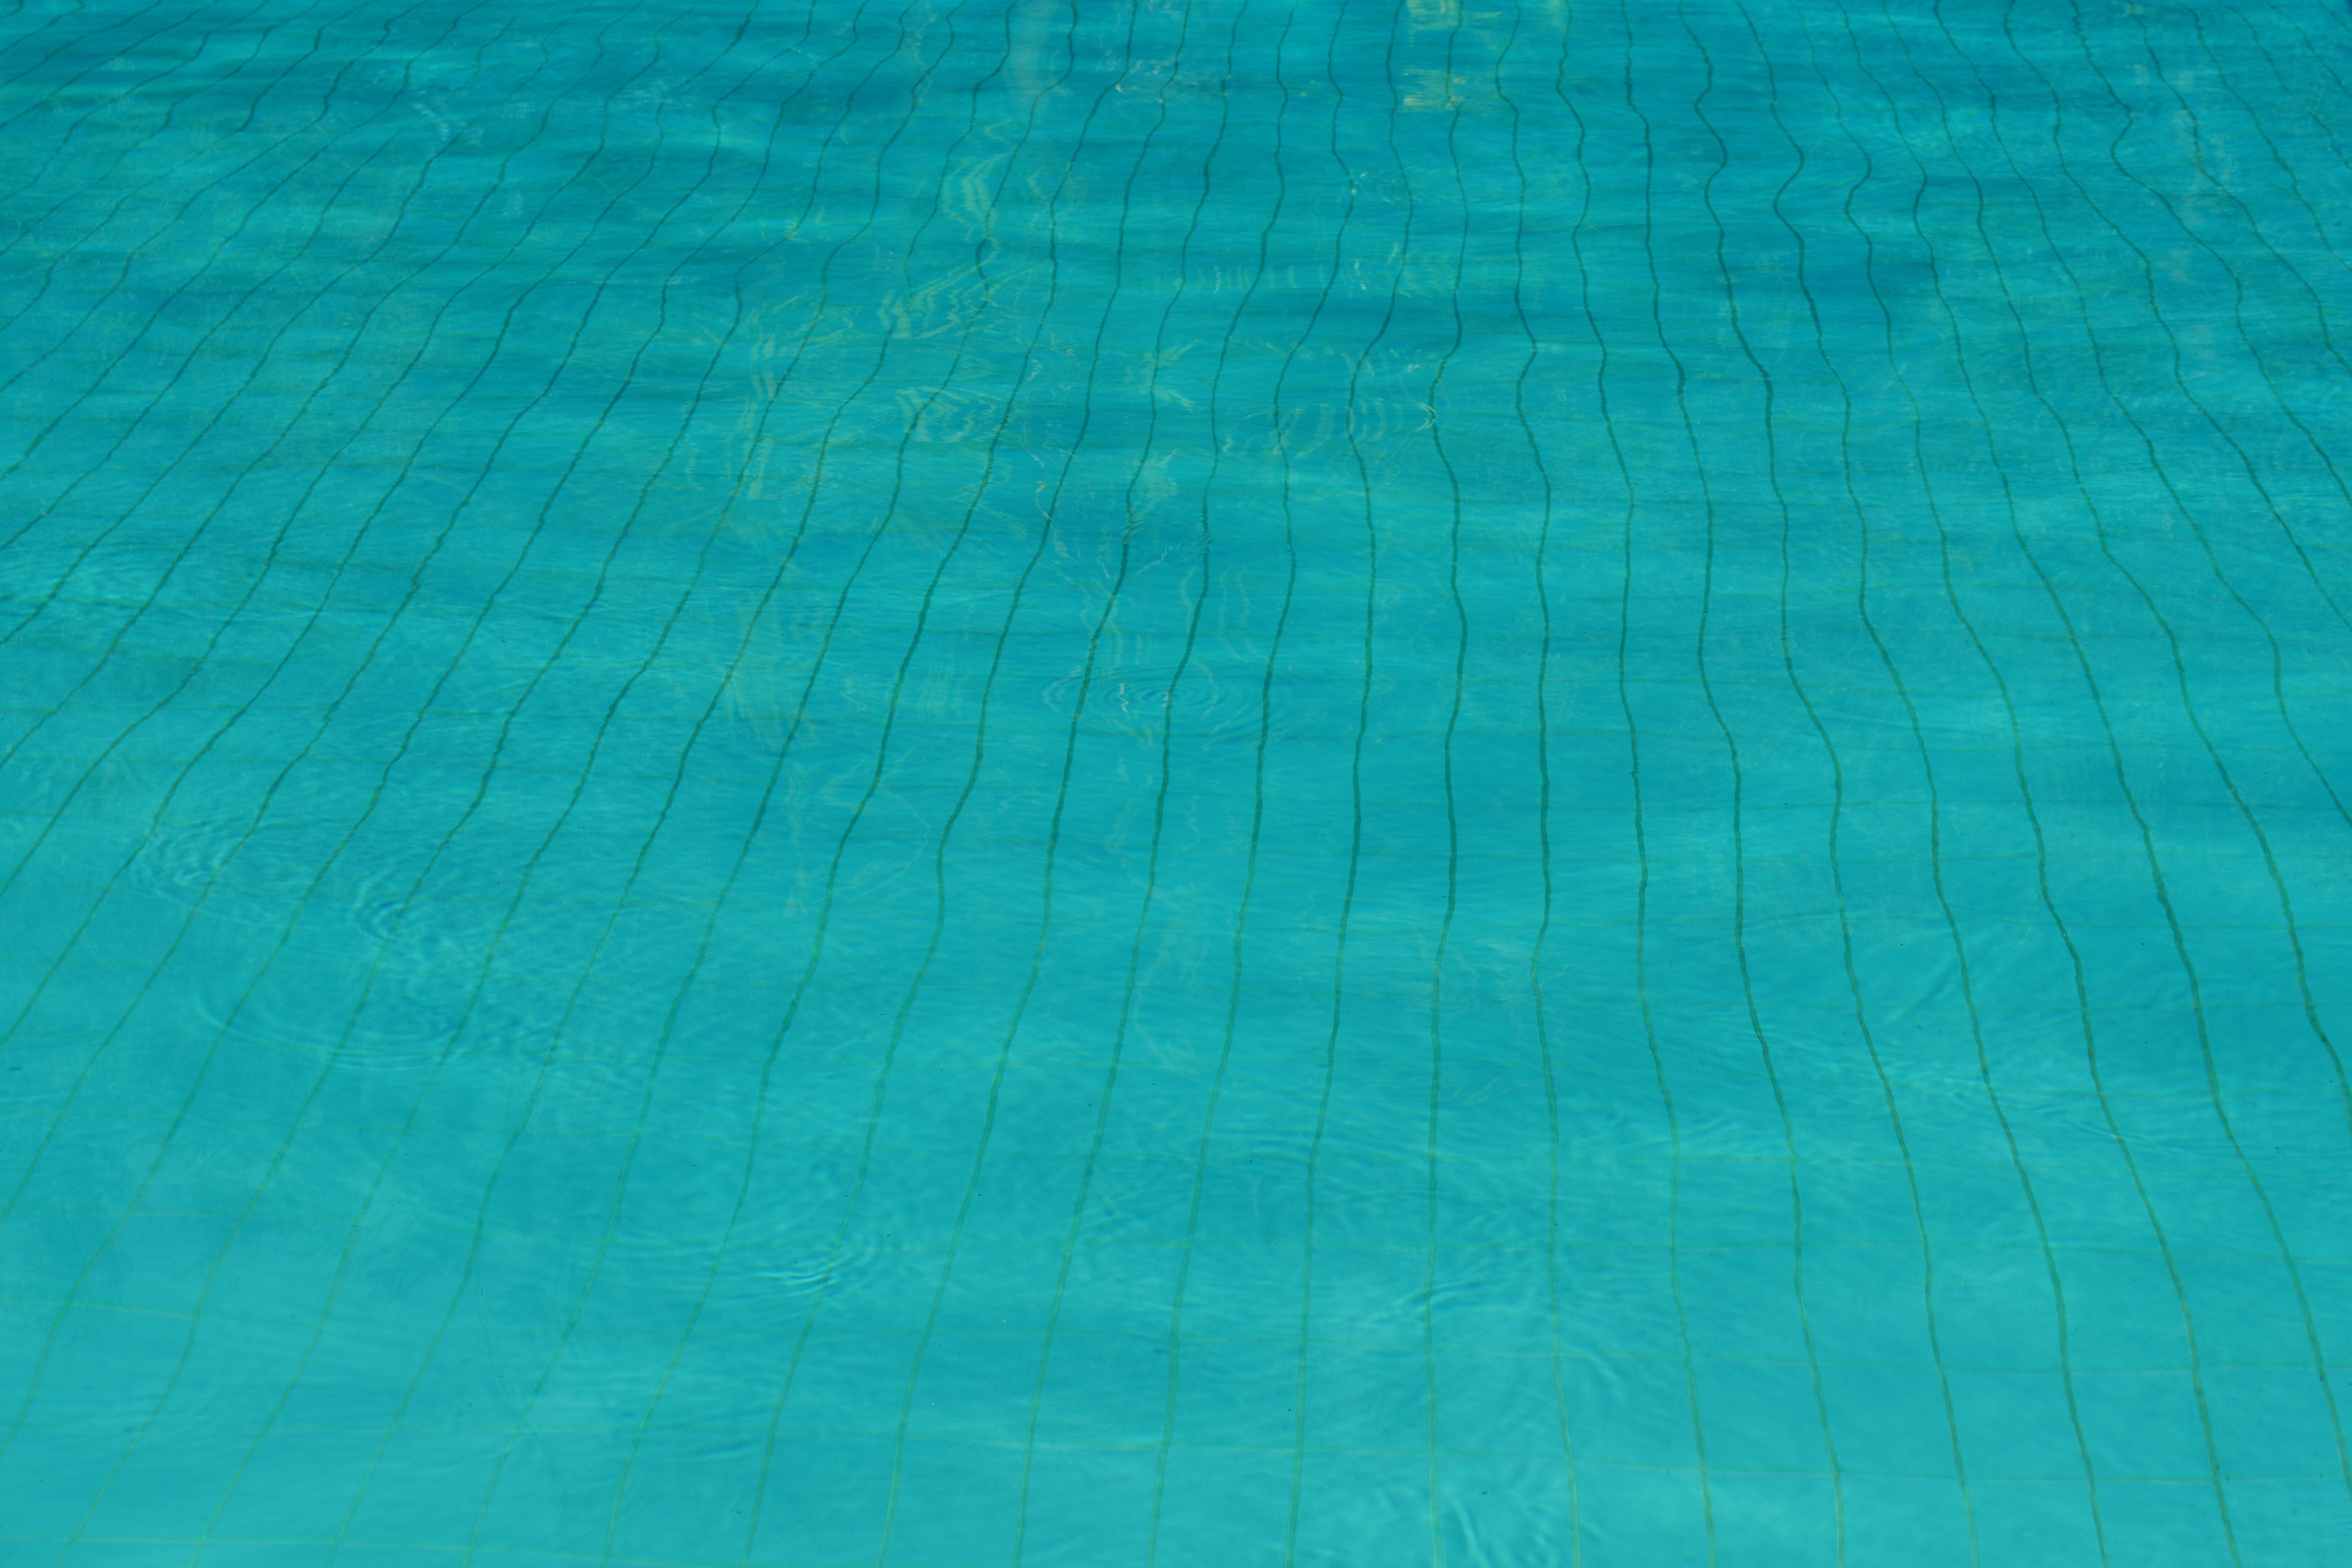 Immagini belle : struttura onda pavimento linea verde piscina